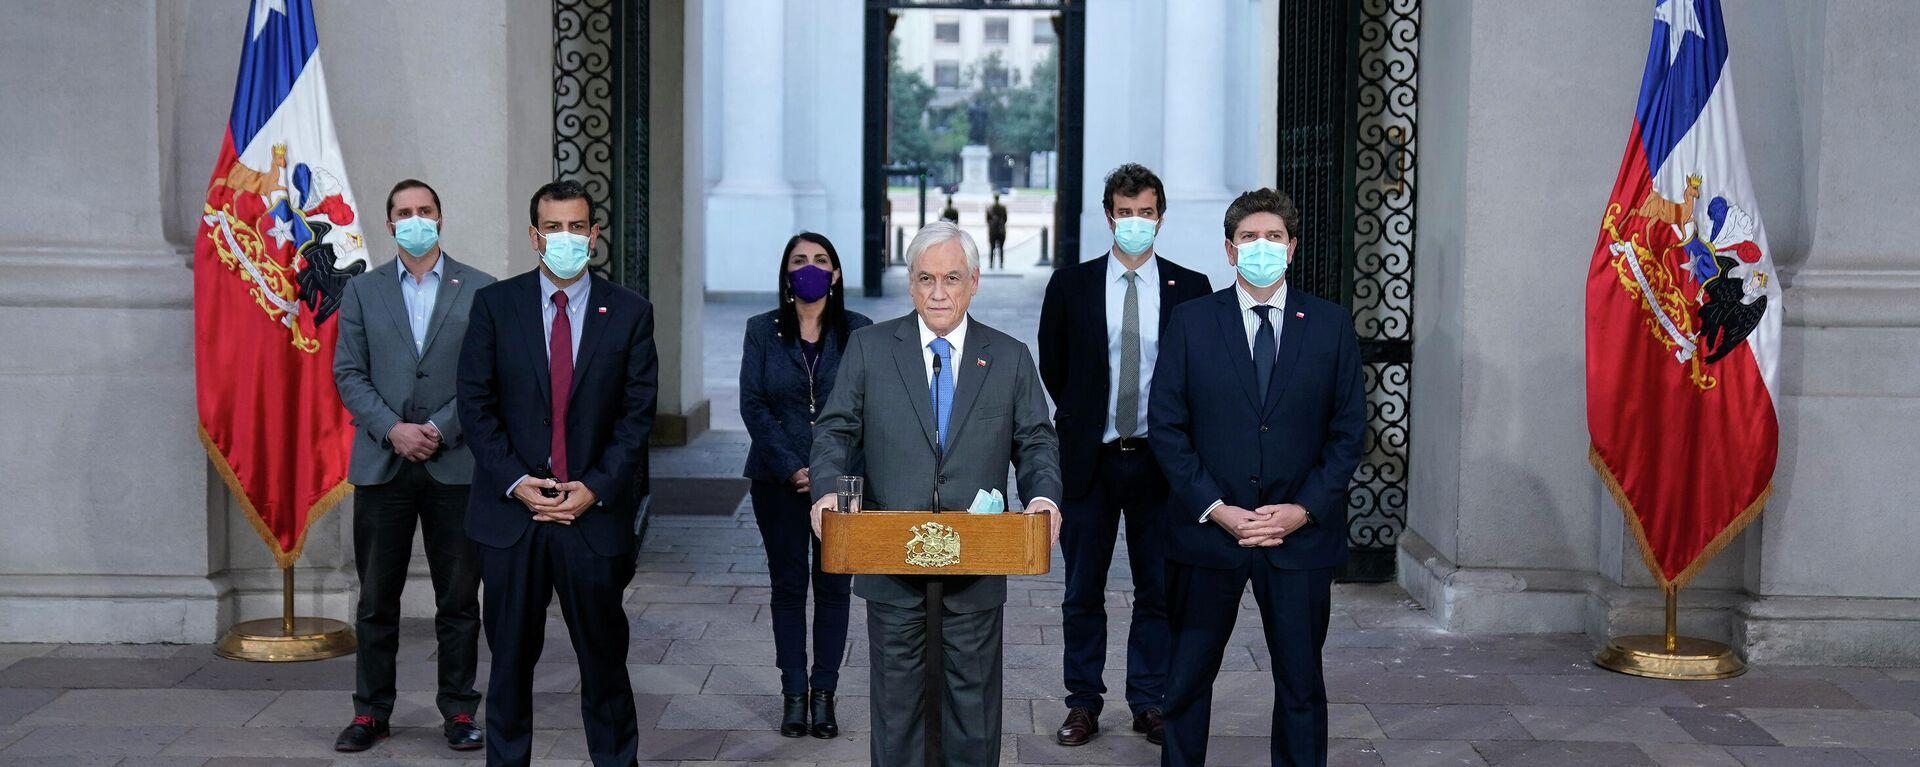 Presidente de Chile, Sebastián Piñera - Sputnik Mundo, 1920, 07.05.2021